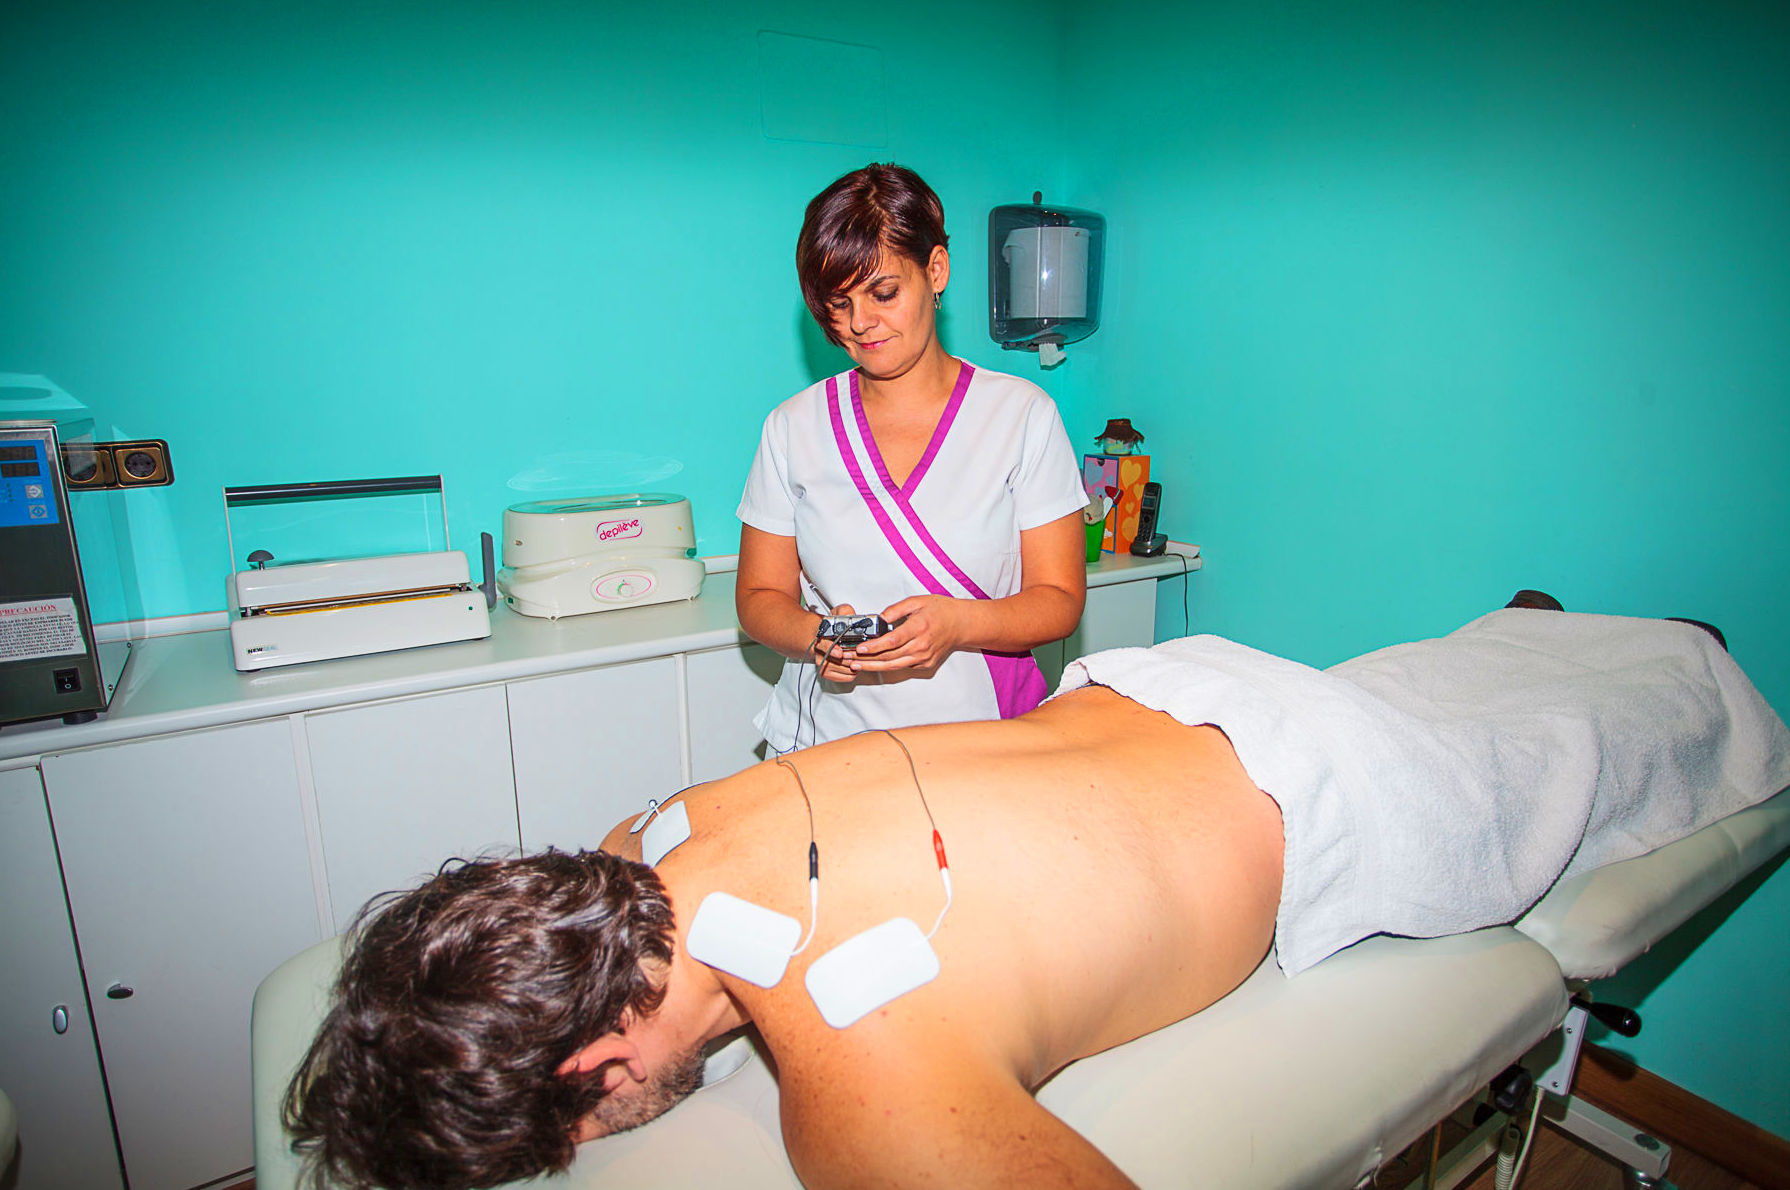 Centro de fisioterapia. Tratamiento con electroterapia.